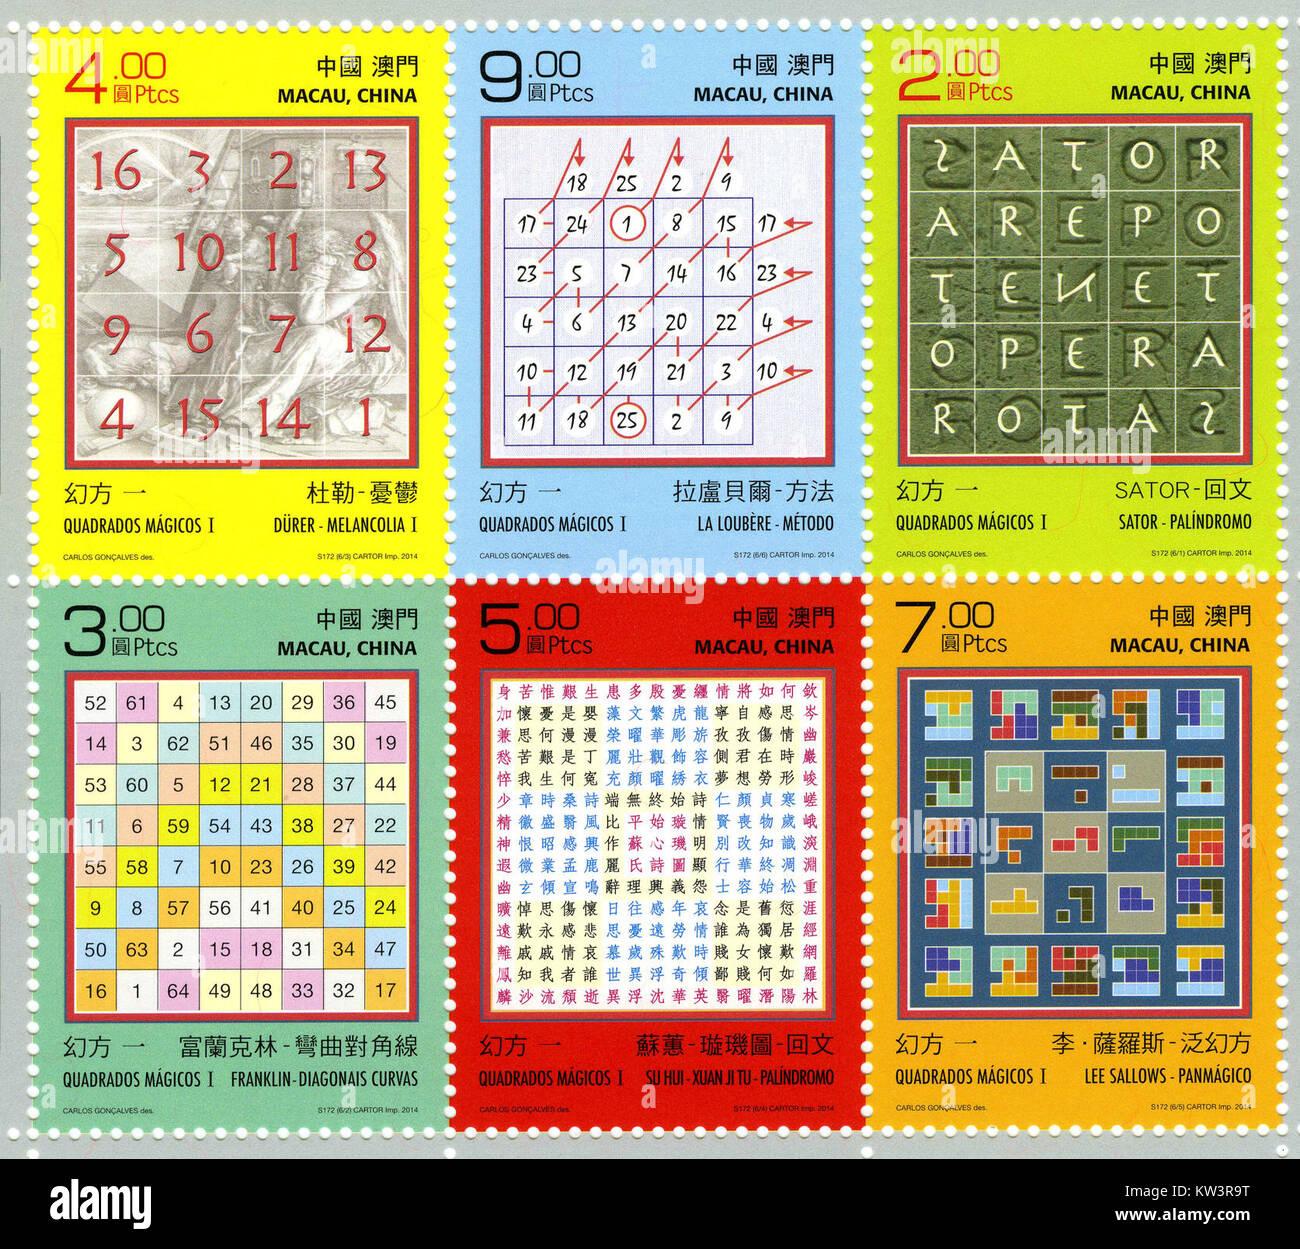 Magic Squares Stock Photos & Magic Squares Stock Images - Alamy